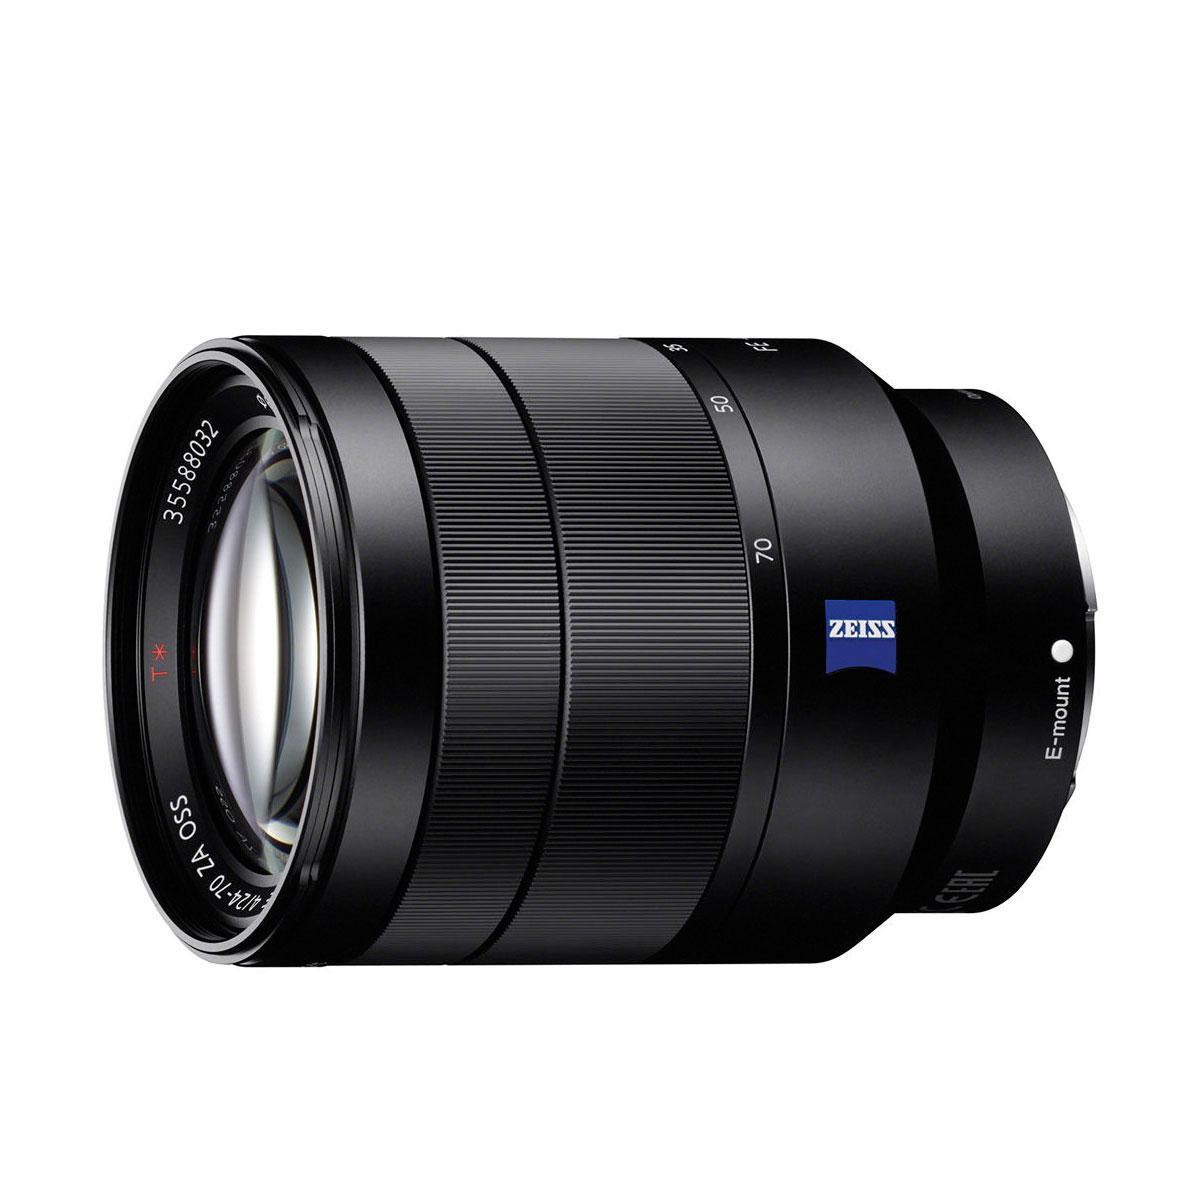 Sony Vario-Tessar T* FE 24-70mm F4 ZA OSS